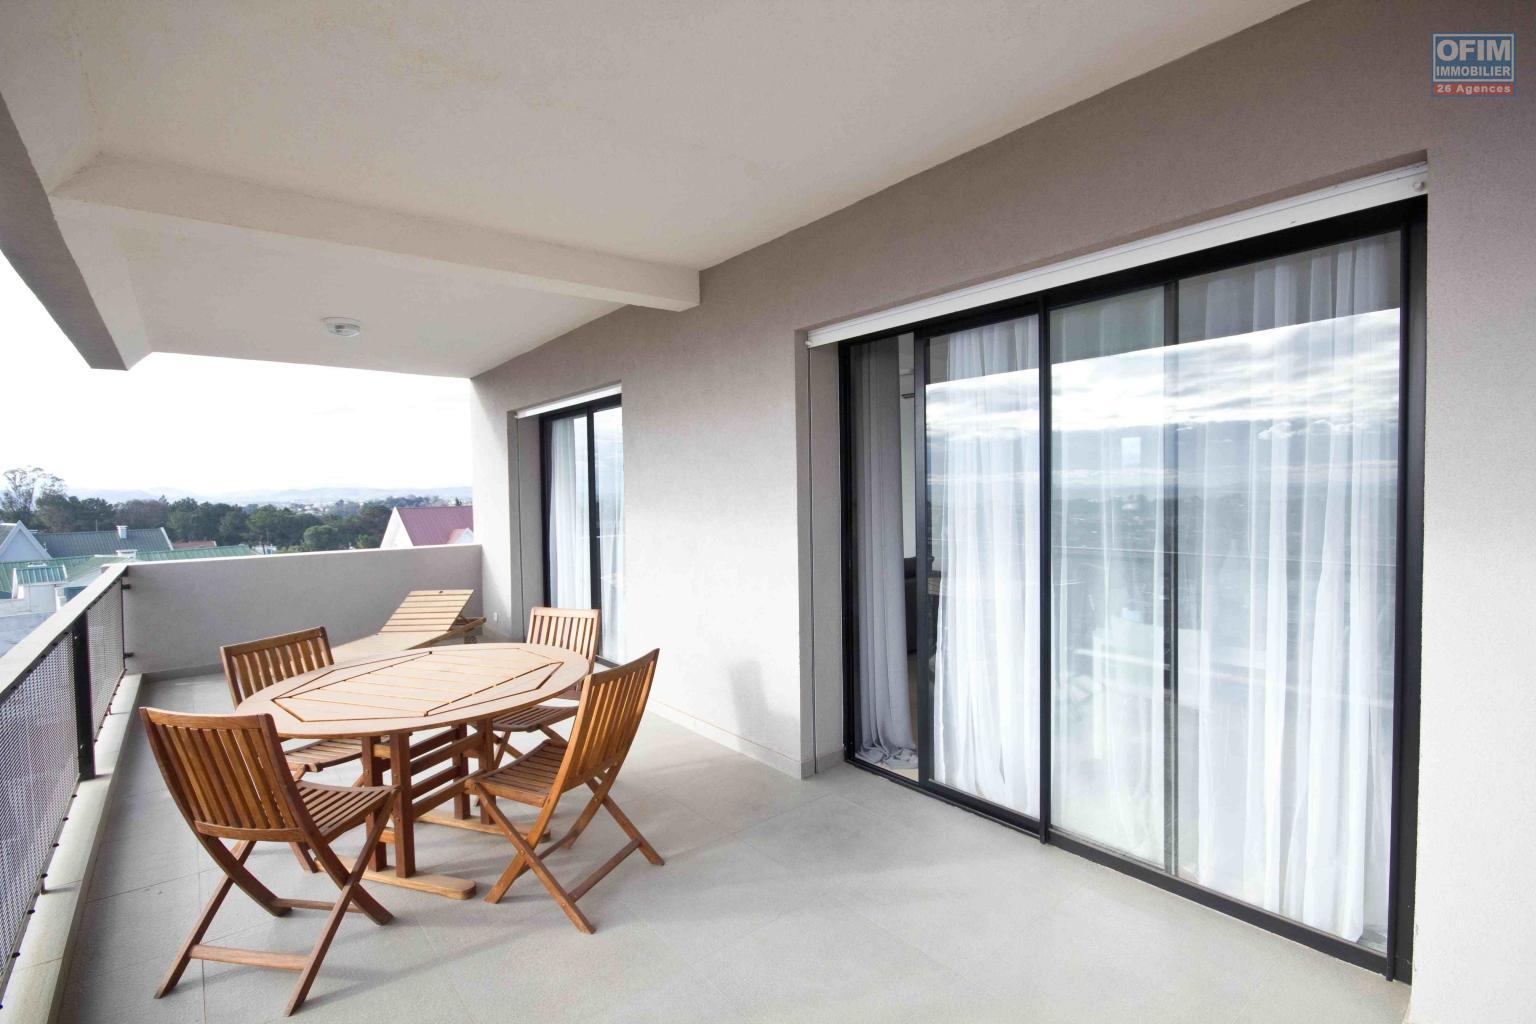 Vente appartement antananarivo tananarive a vendre - Magnifique appartement de vacances pubillones ...